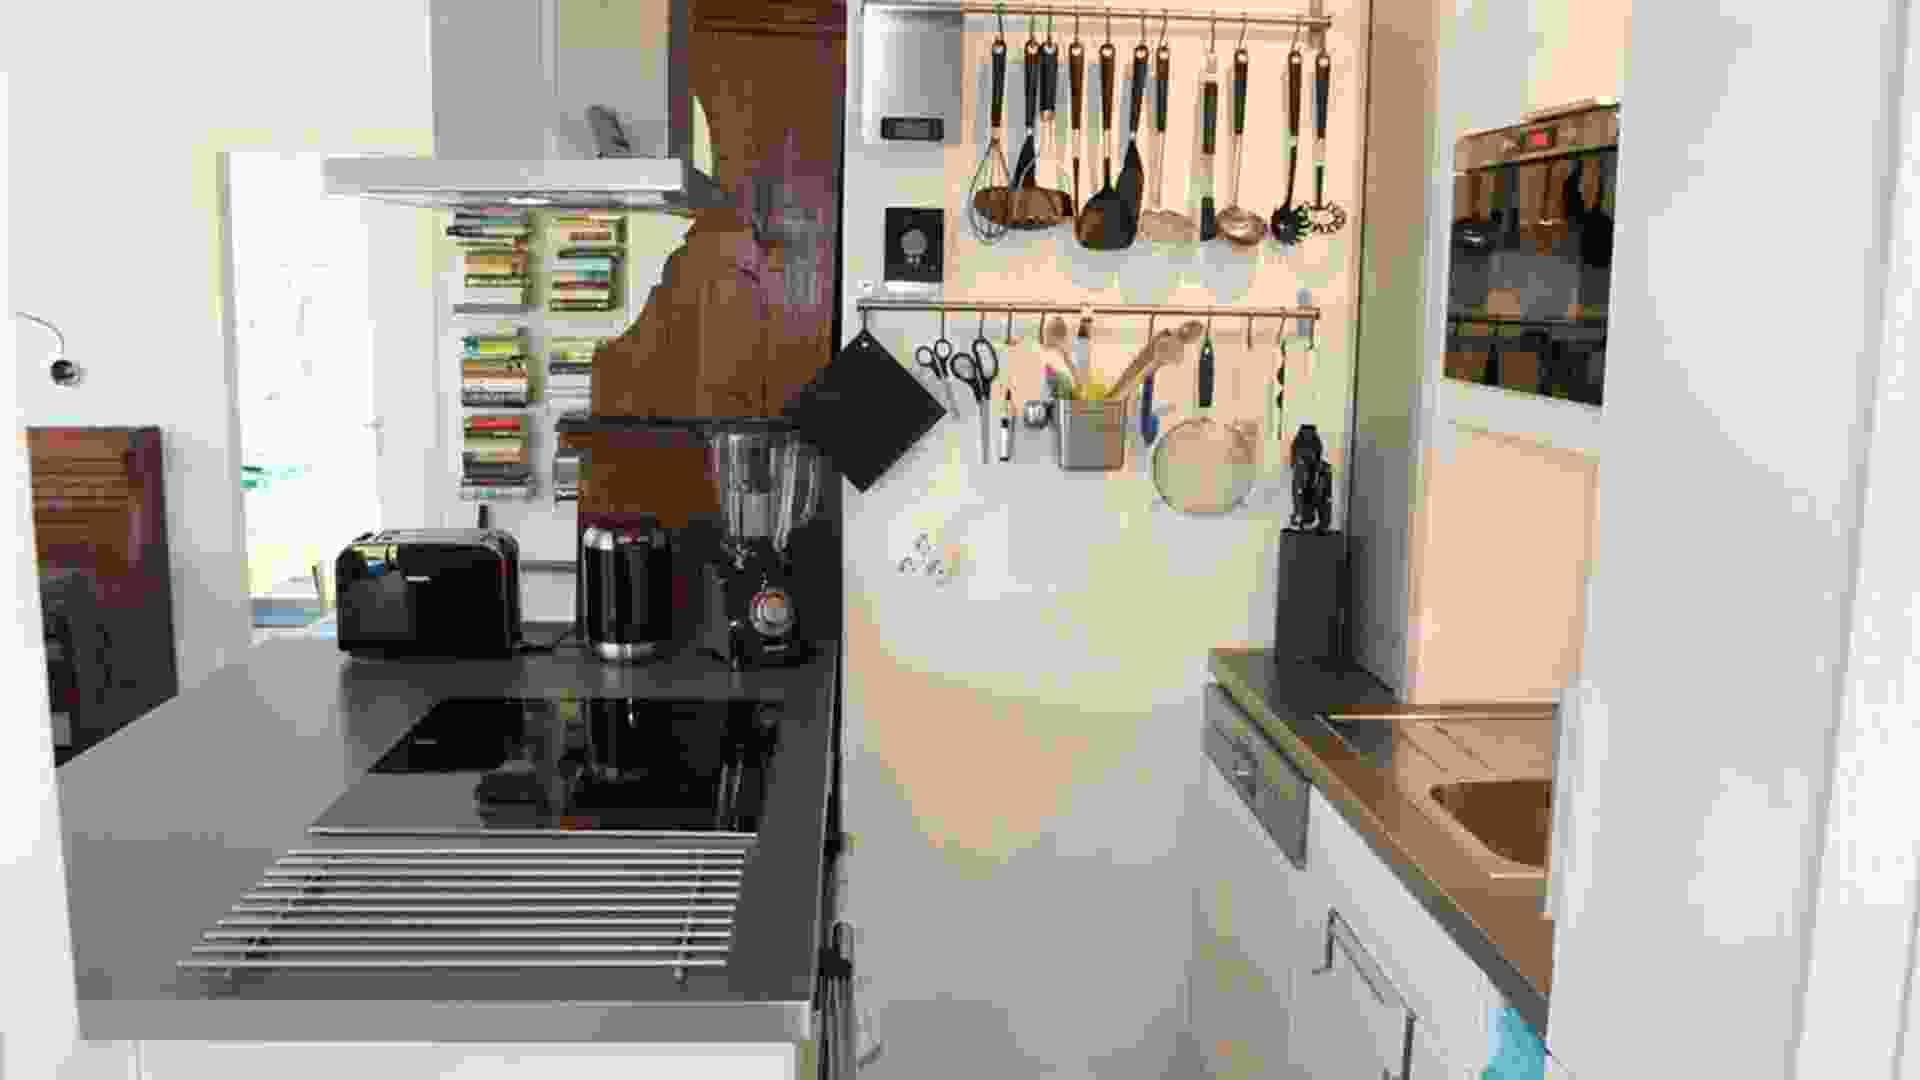 Foto 7, keuken